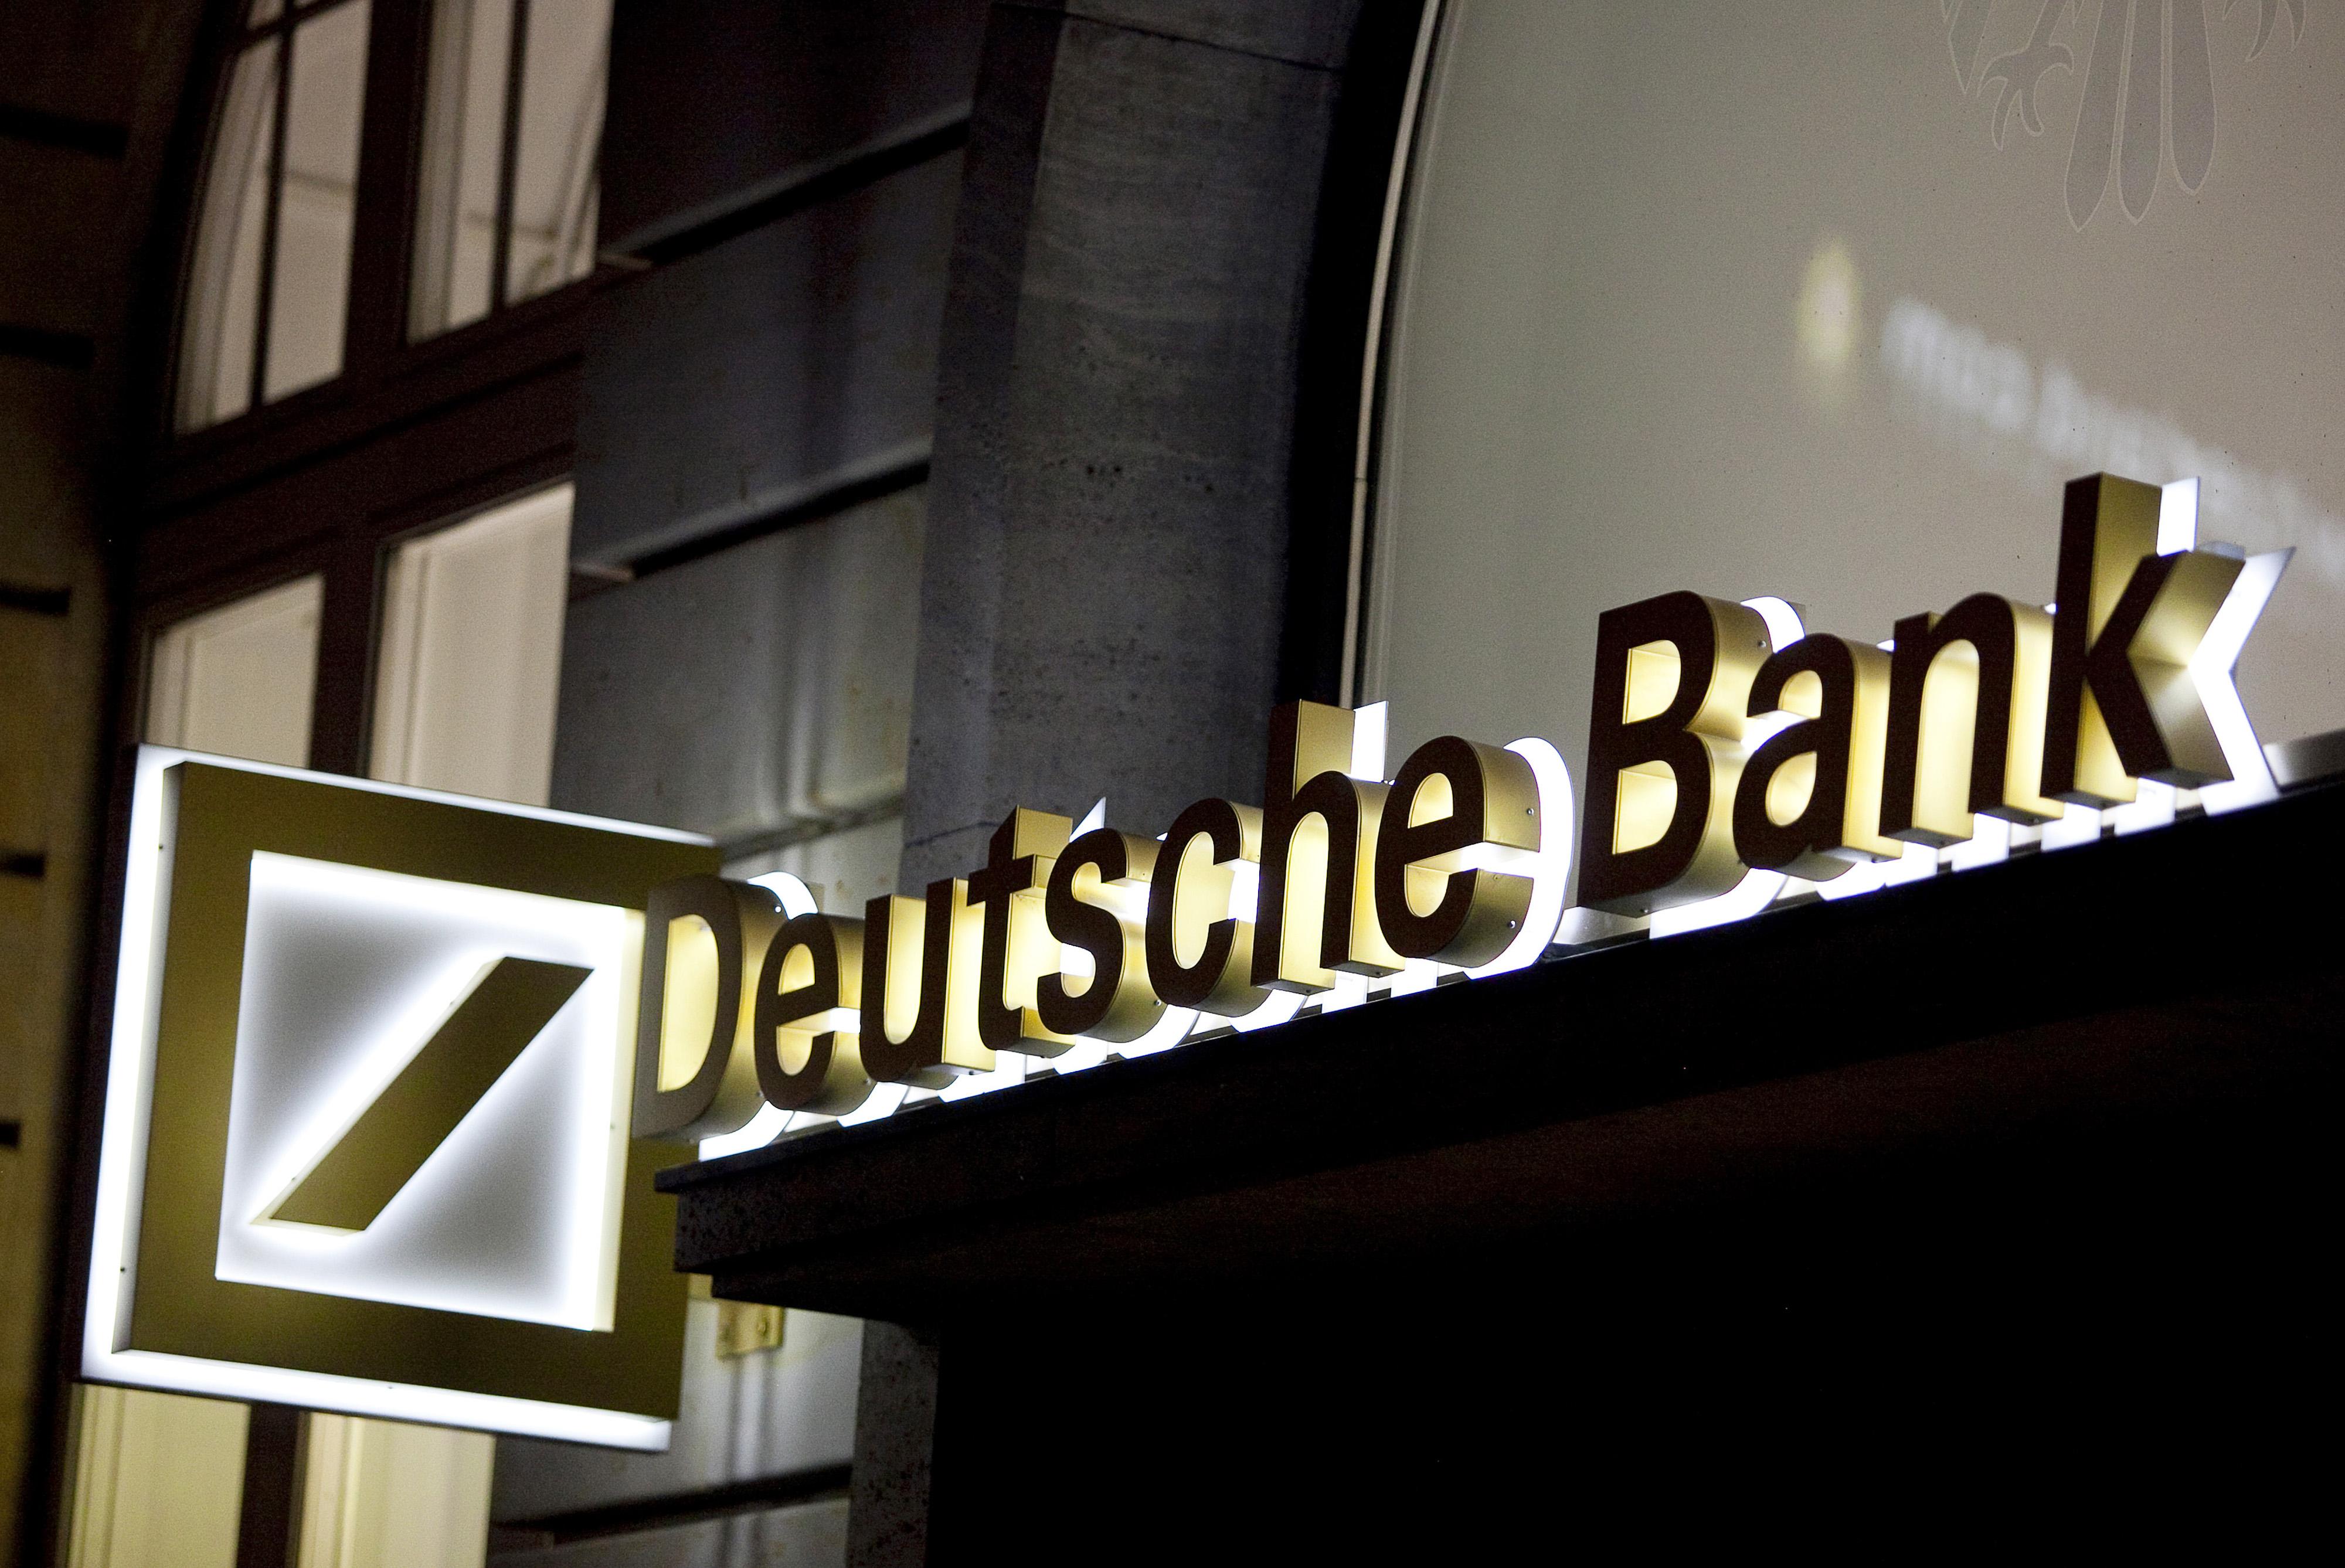 https://assets.sourcemedia.com/ea/dc/3657c1144920a0e48da0bf1dd847/deutsche-bank-bl-073113.jpg